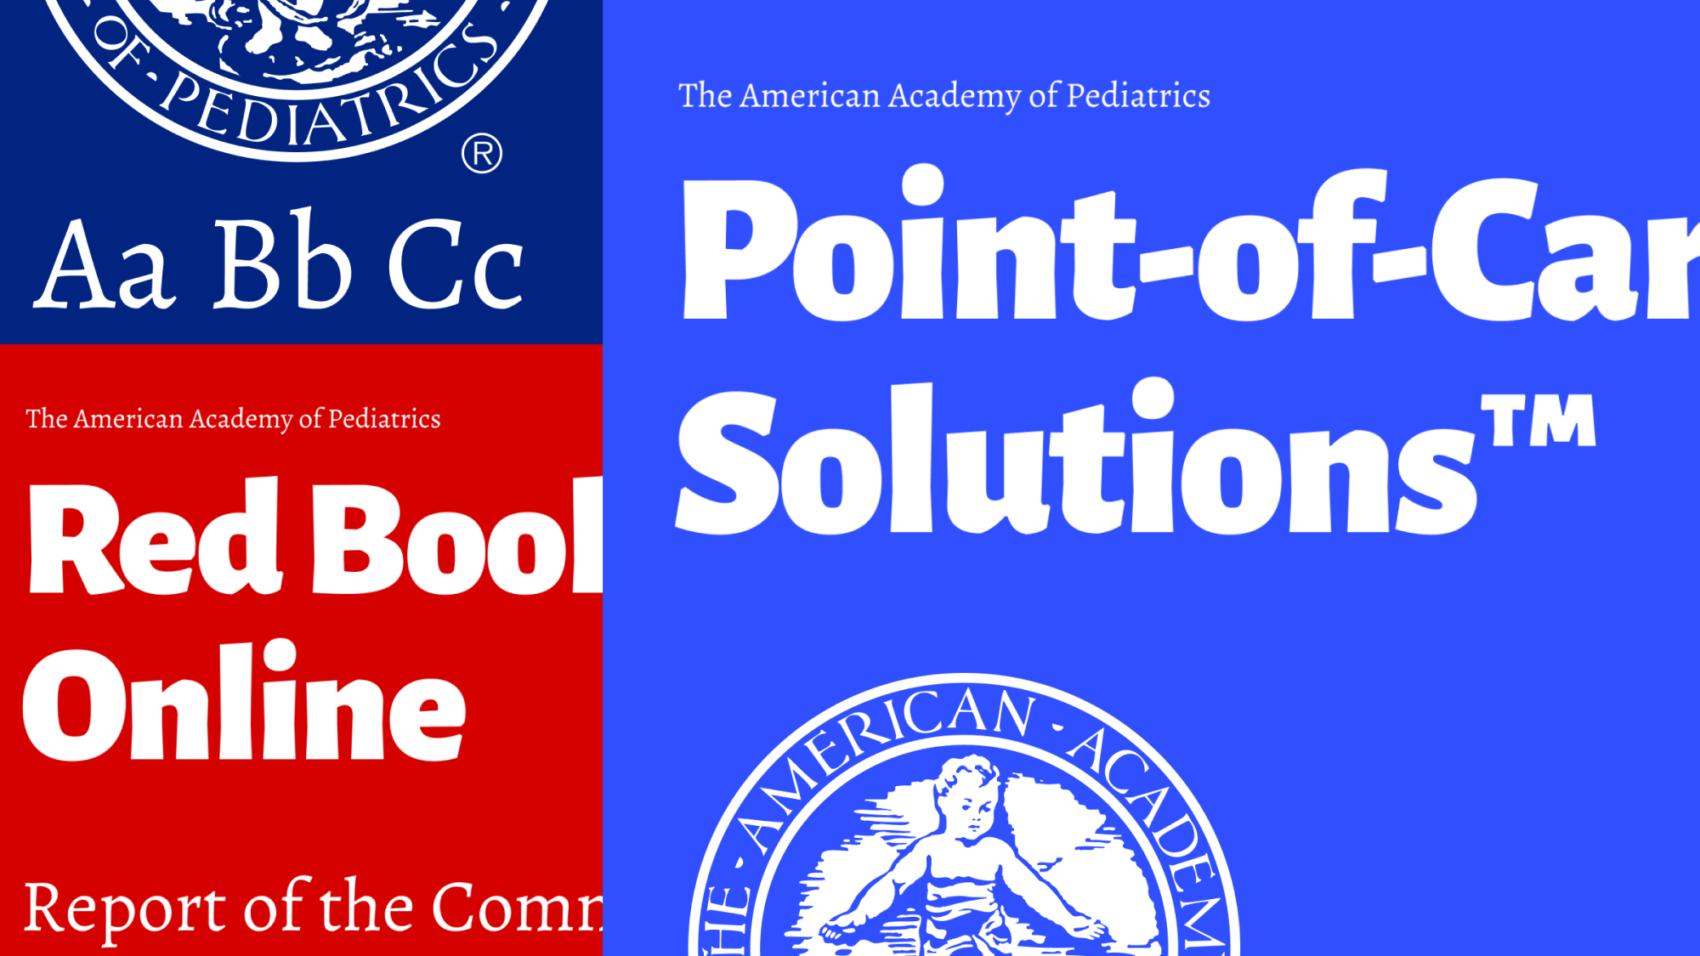 Branding for American Academy of Pediatrics - Redbook - by Adage Technologies